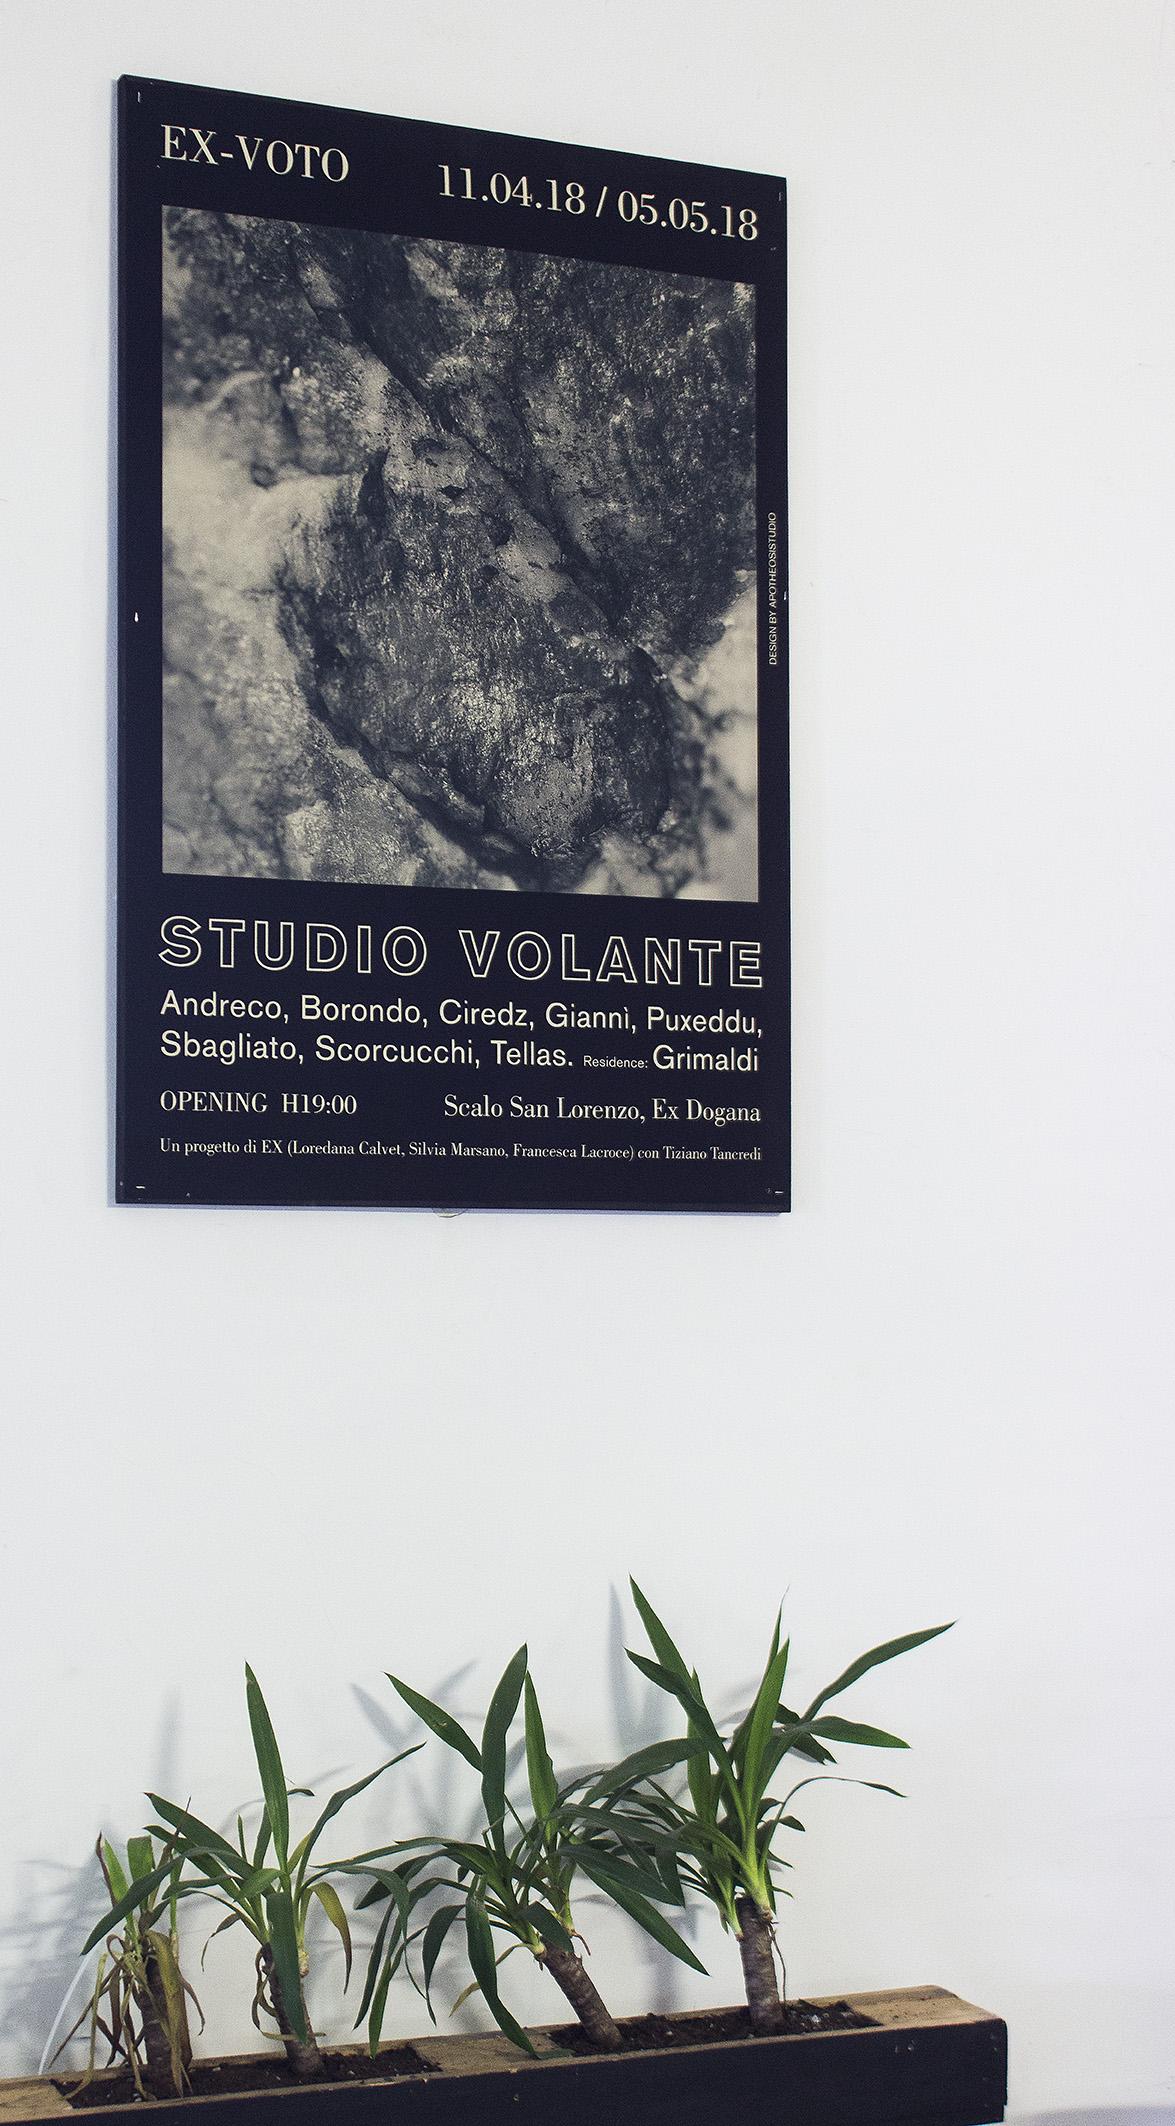 ex-voto-mostra-ex-dogana-roma Studio Volante